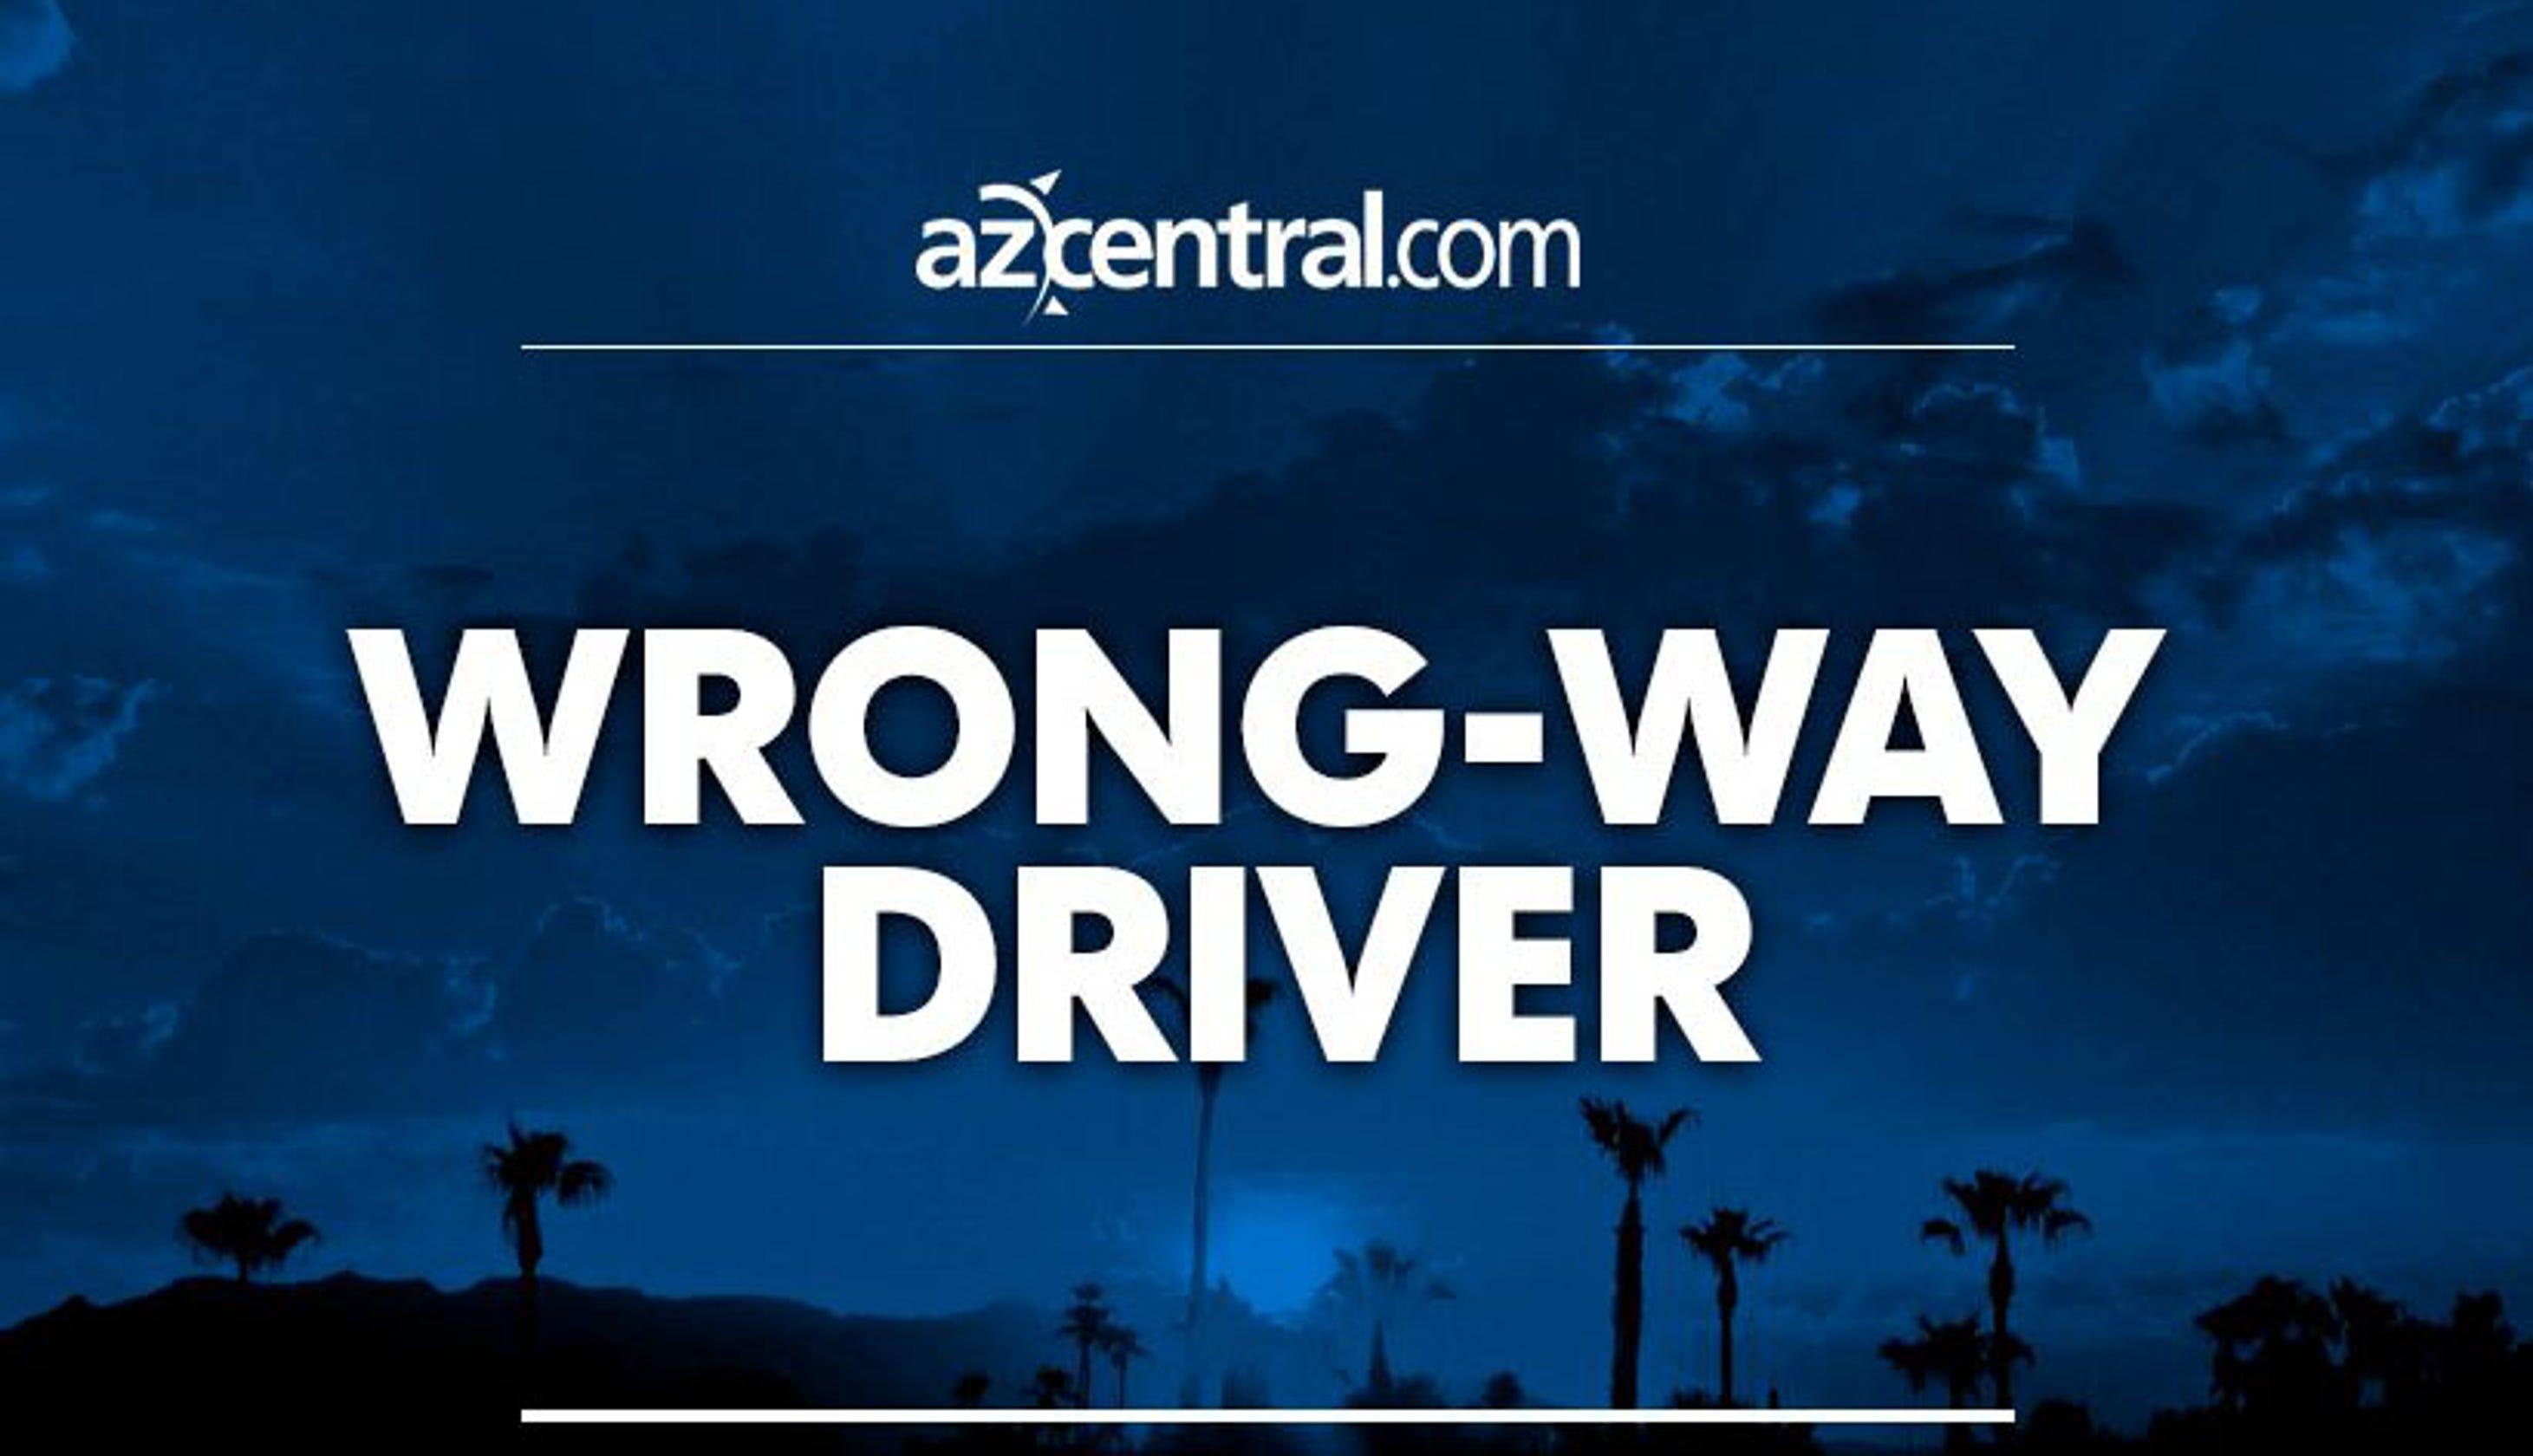 Five fatalities in wrong-way crash west of Kingman on I-40